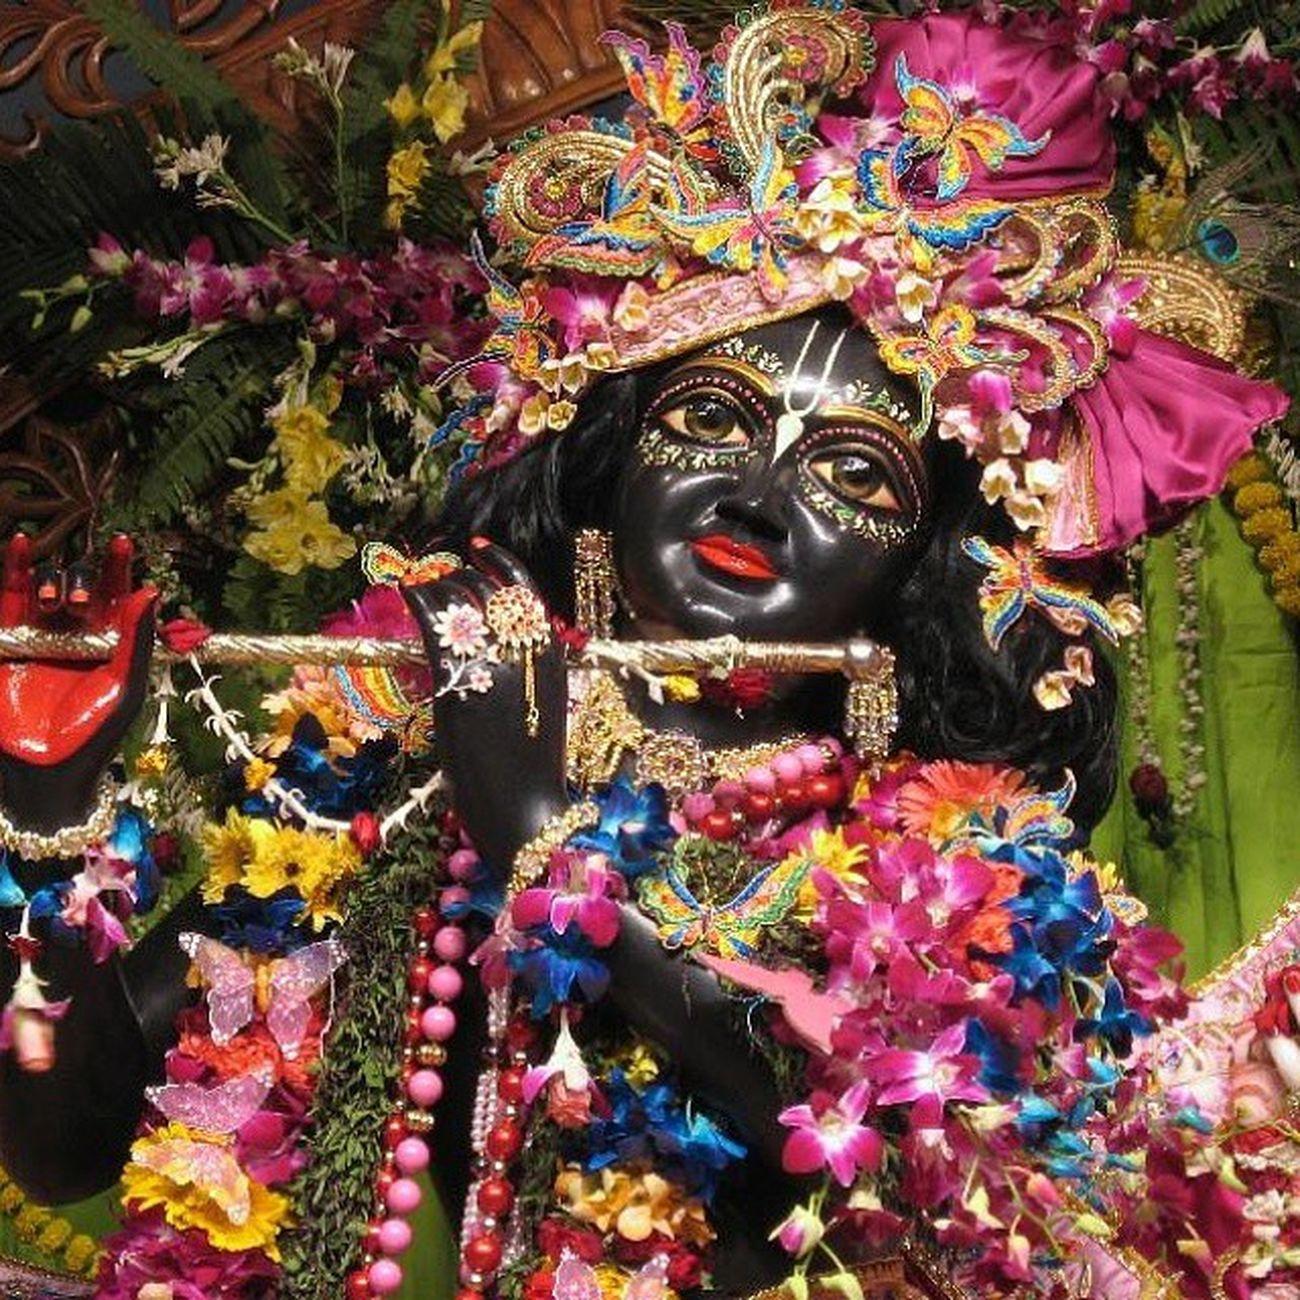 Lord Krishna Nitai Krshna iskcon conciousness international society chanting mangala me my love vaishnav vaishnavas instadaily instamood eyes shringar flute lips cheeks hand fingers amazing picoftheday bestoftheday TFLers TagsForLikes